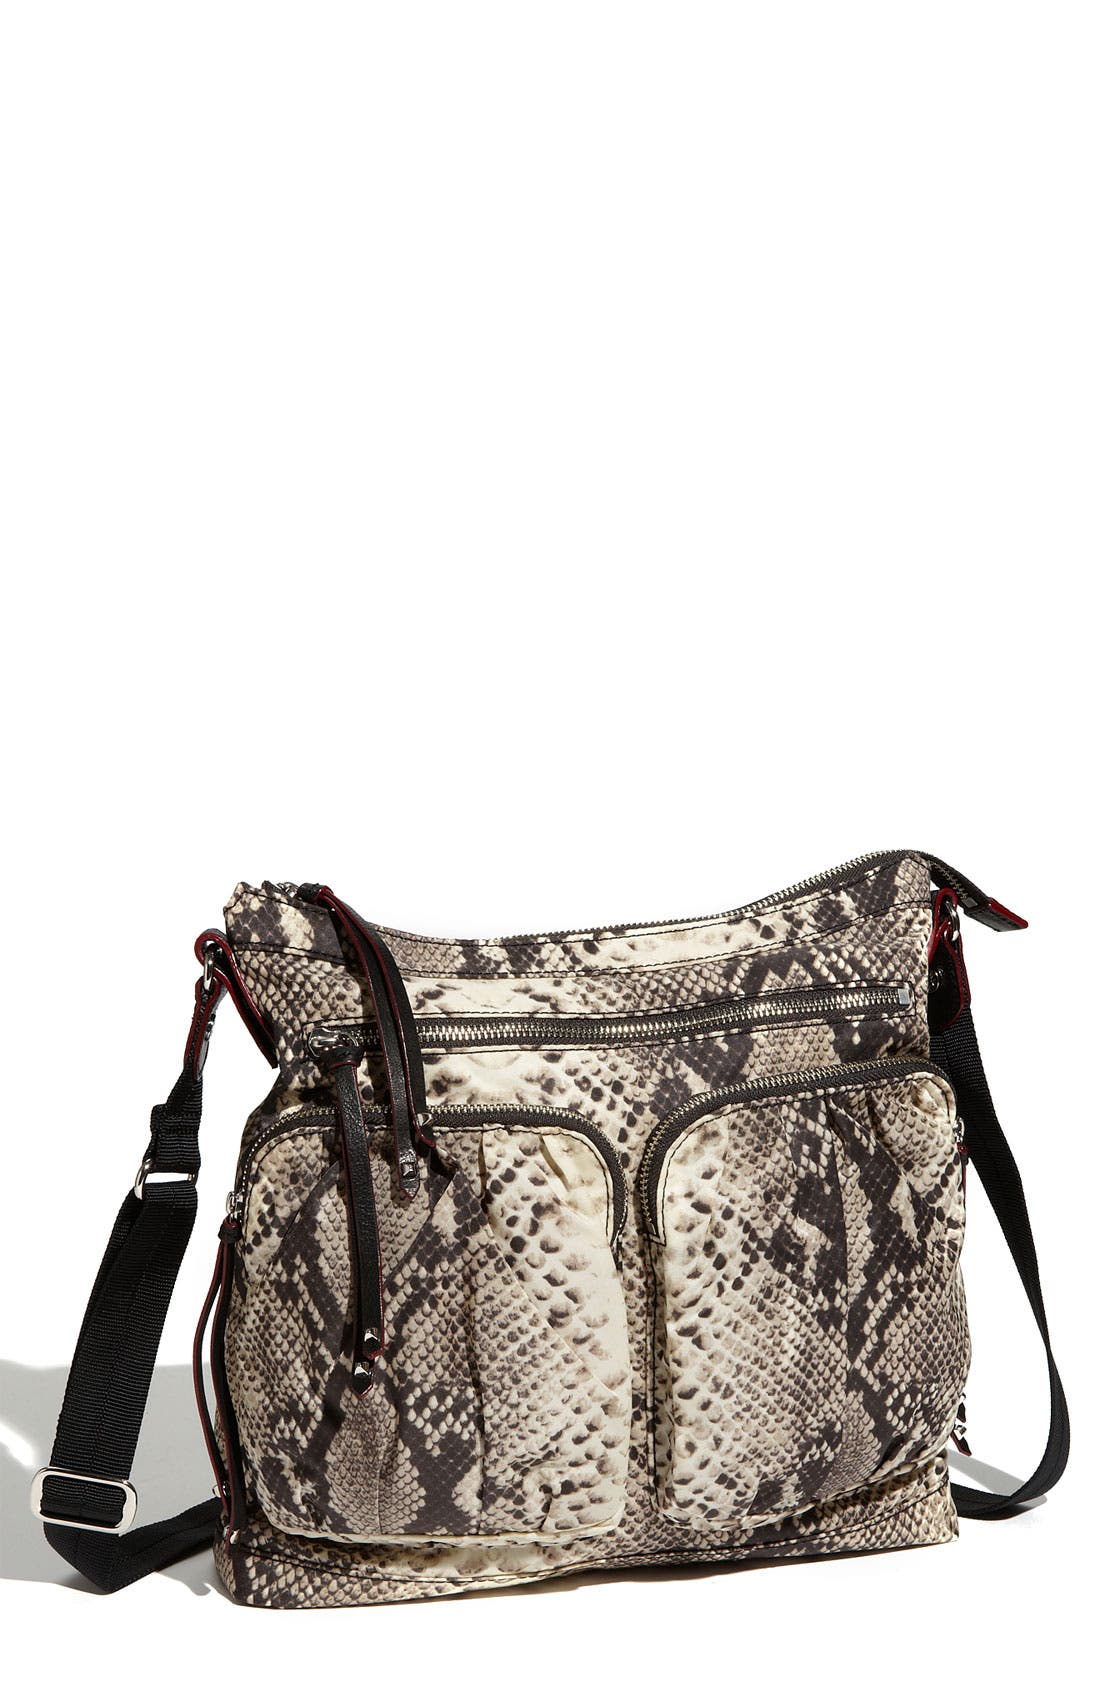 Main Image - M Z Wallace 'Mia' Snake Print Crossbody Bag